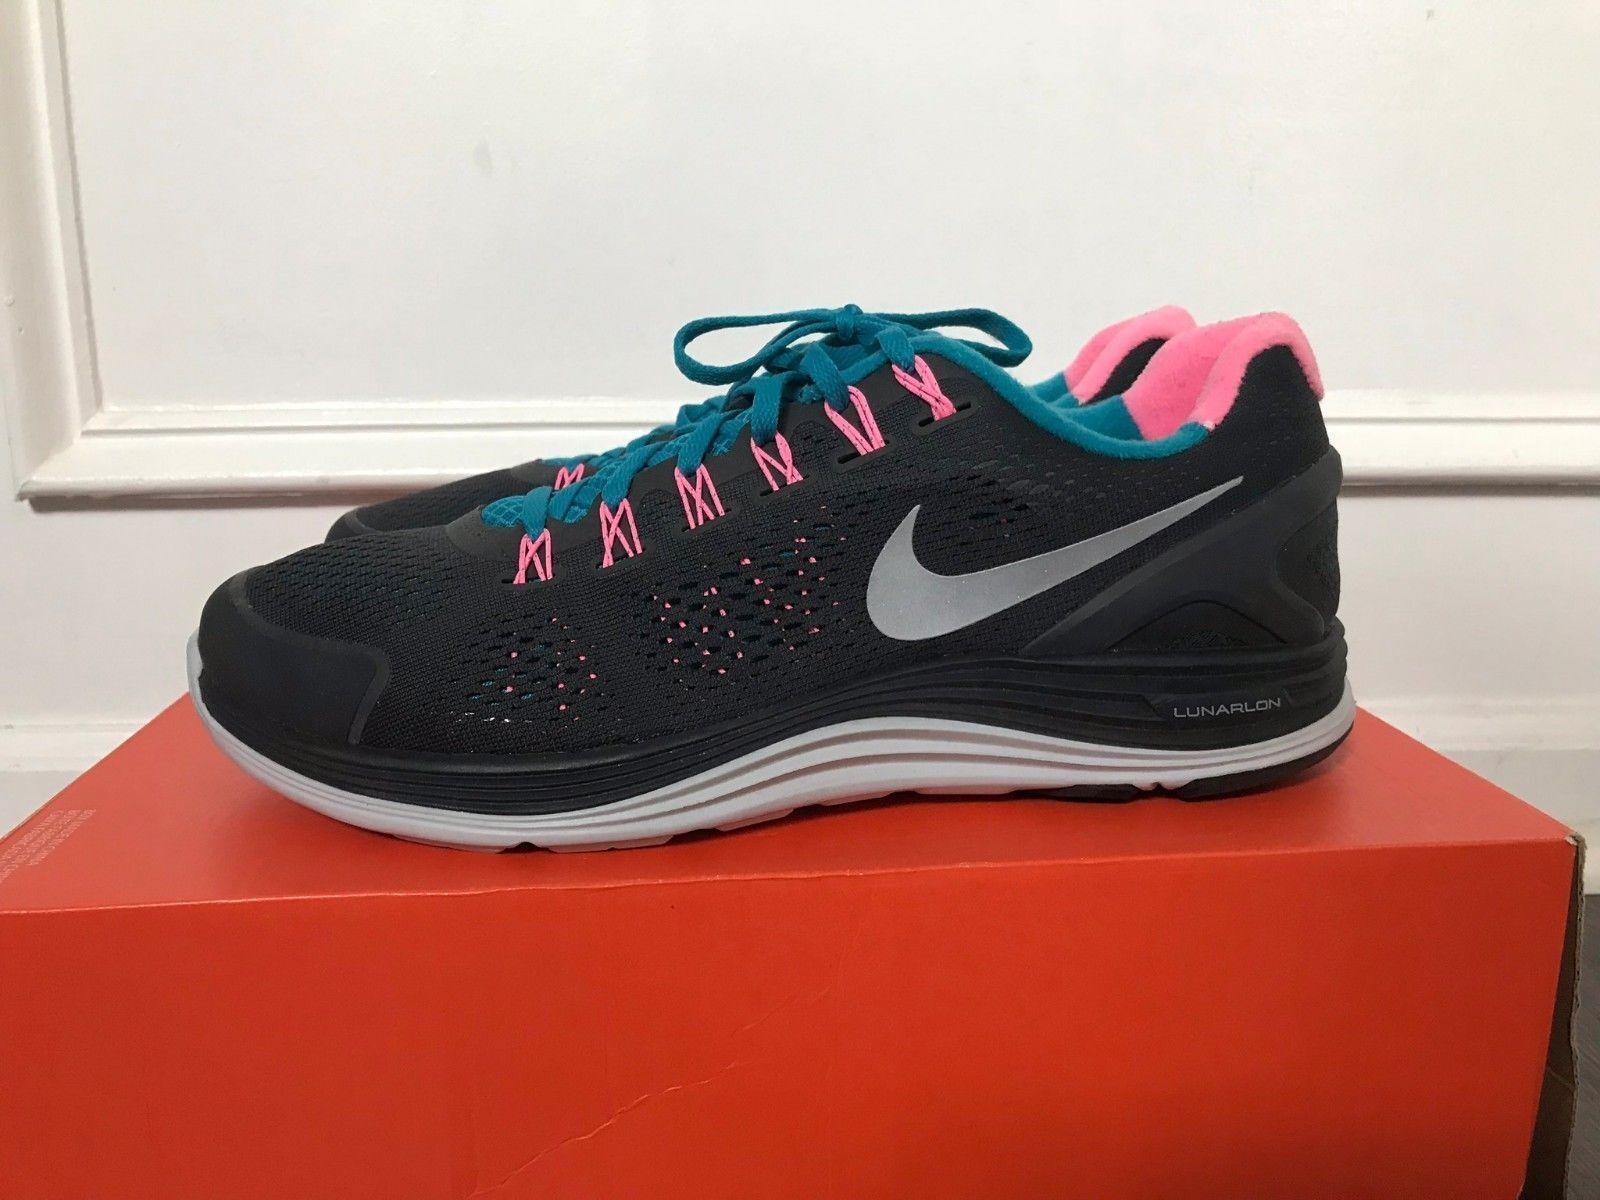 Men's Nike LunarGlide+ 4 Running shoes Midnight Navy bluee 524977 010 NEW 11.5